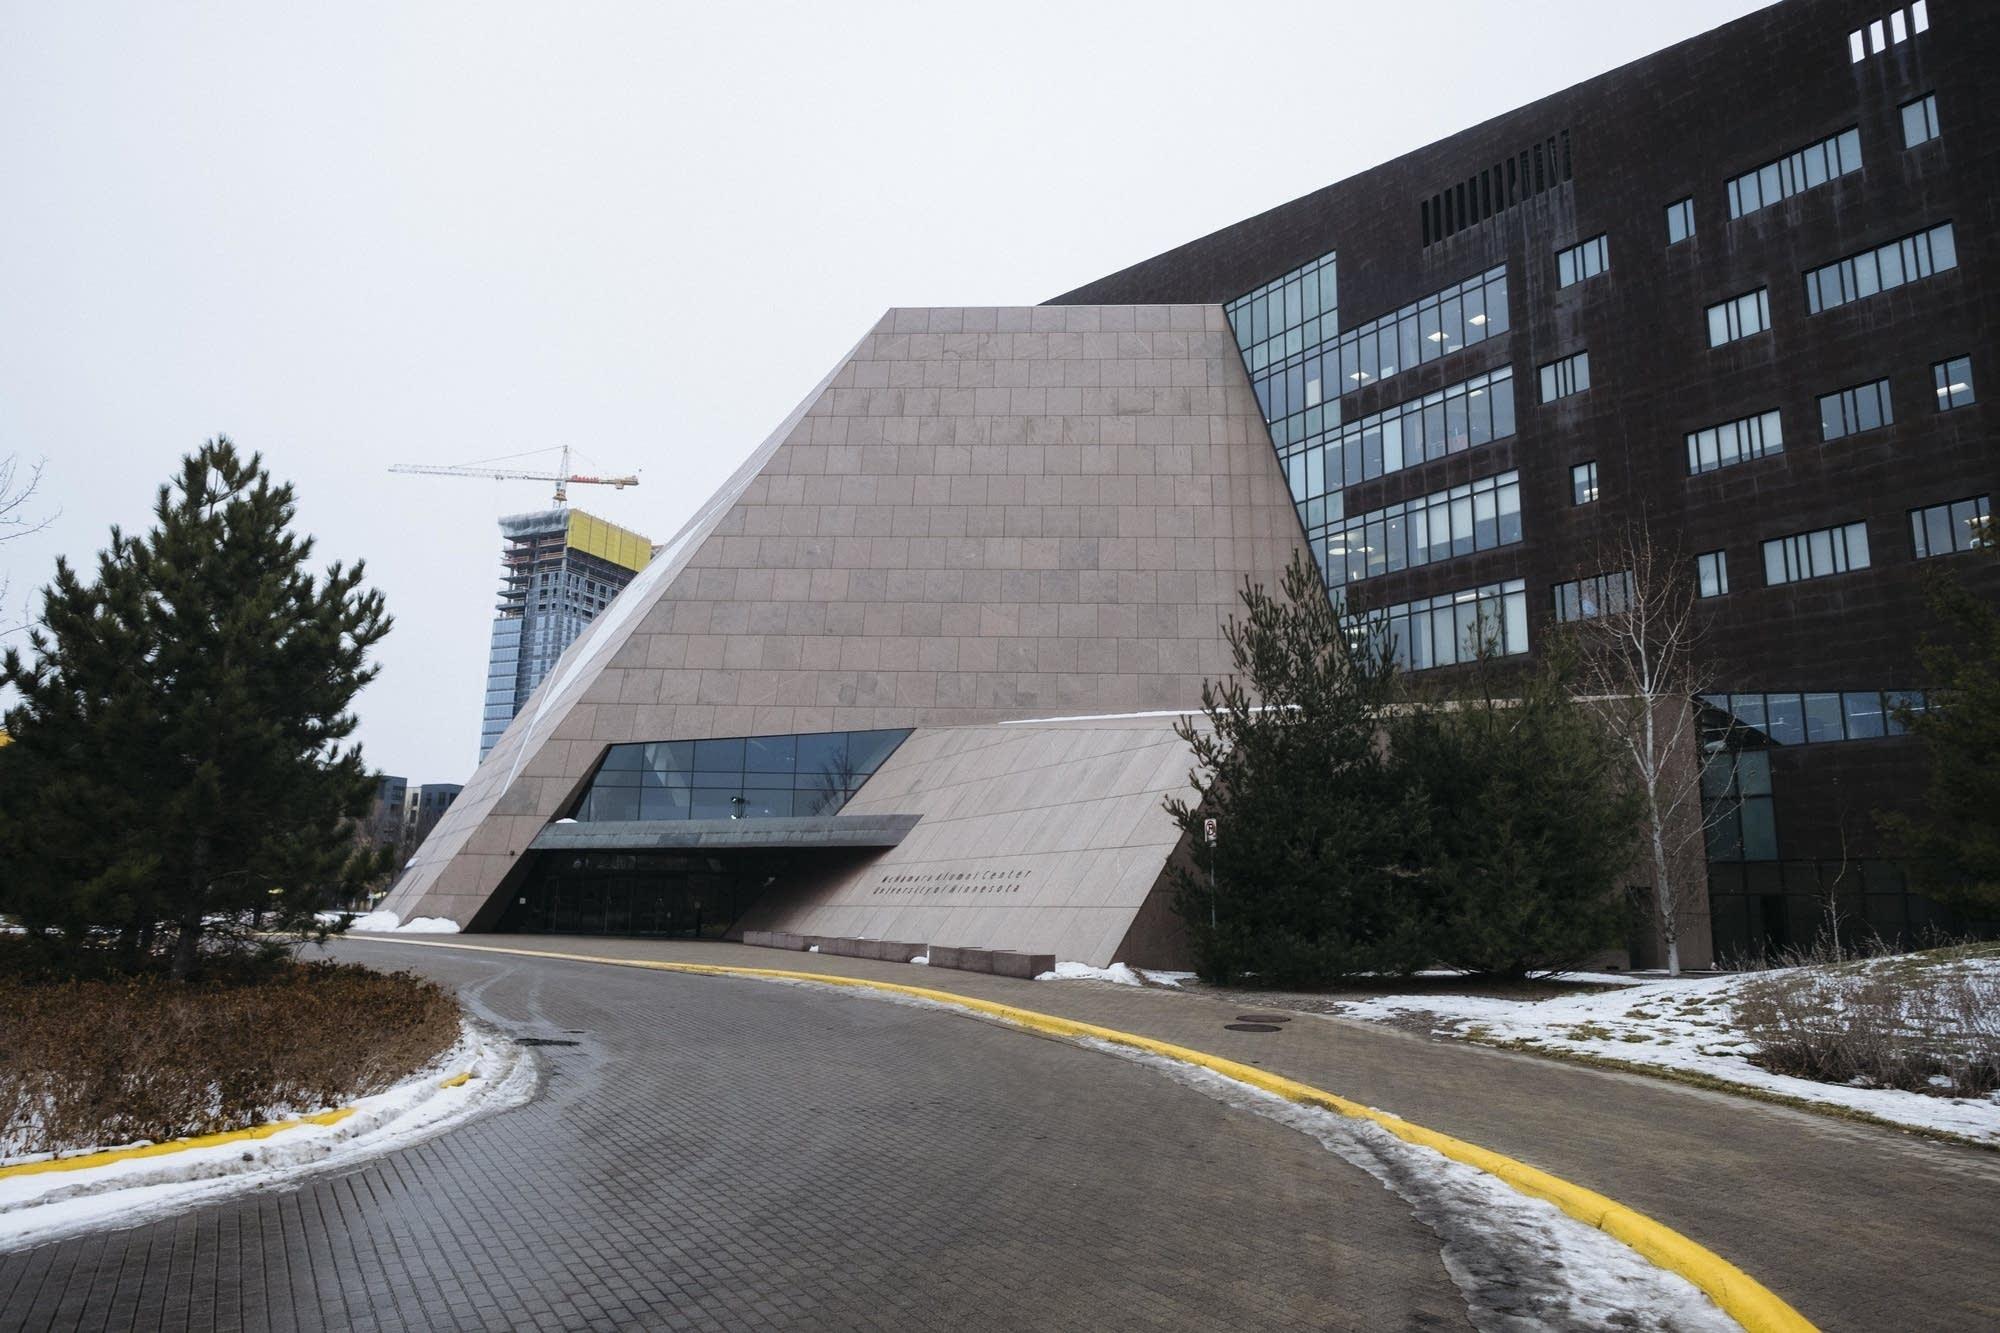 The University of Minnesota's McNamara Alumni Center